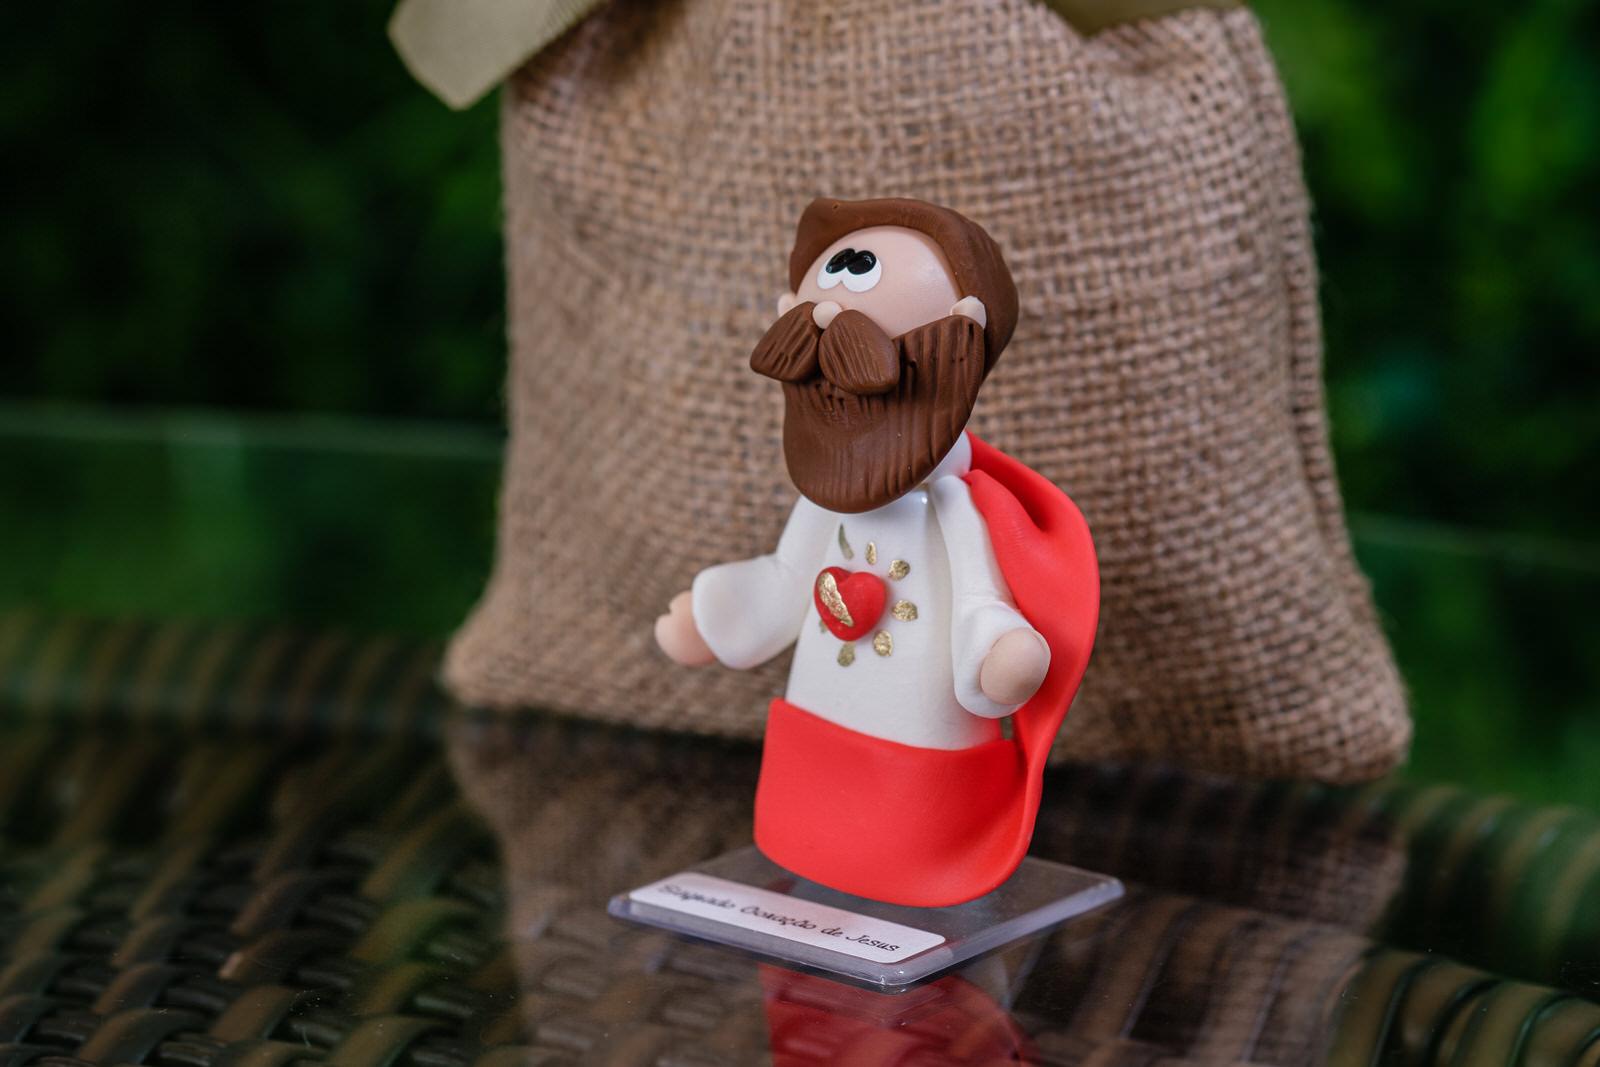 Sagrado Coração de Jesus em Biscuit